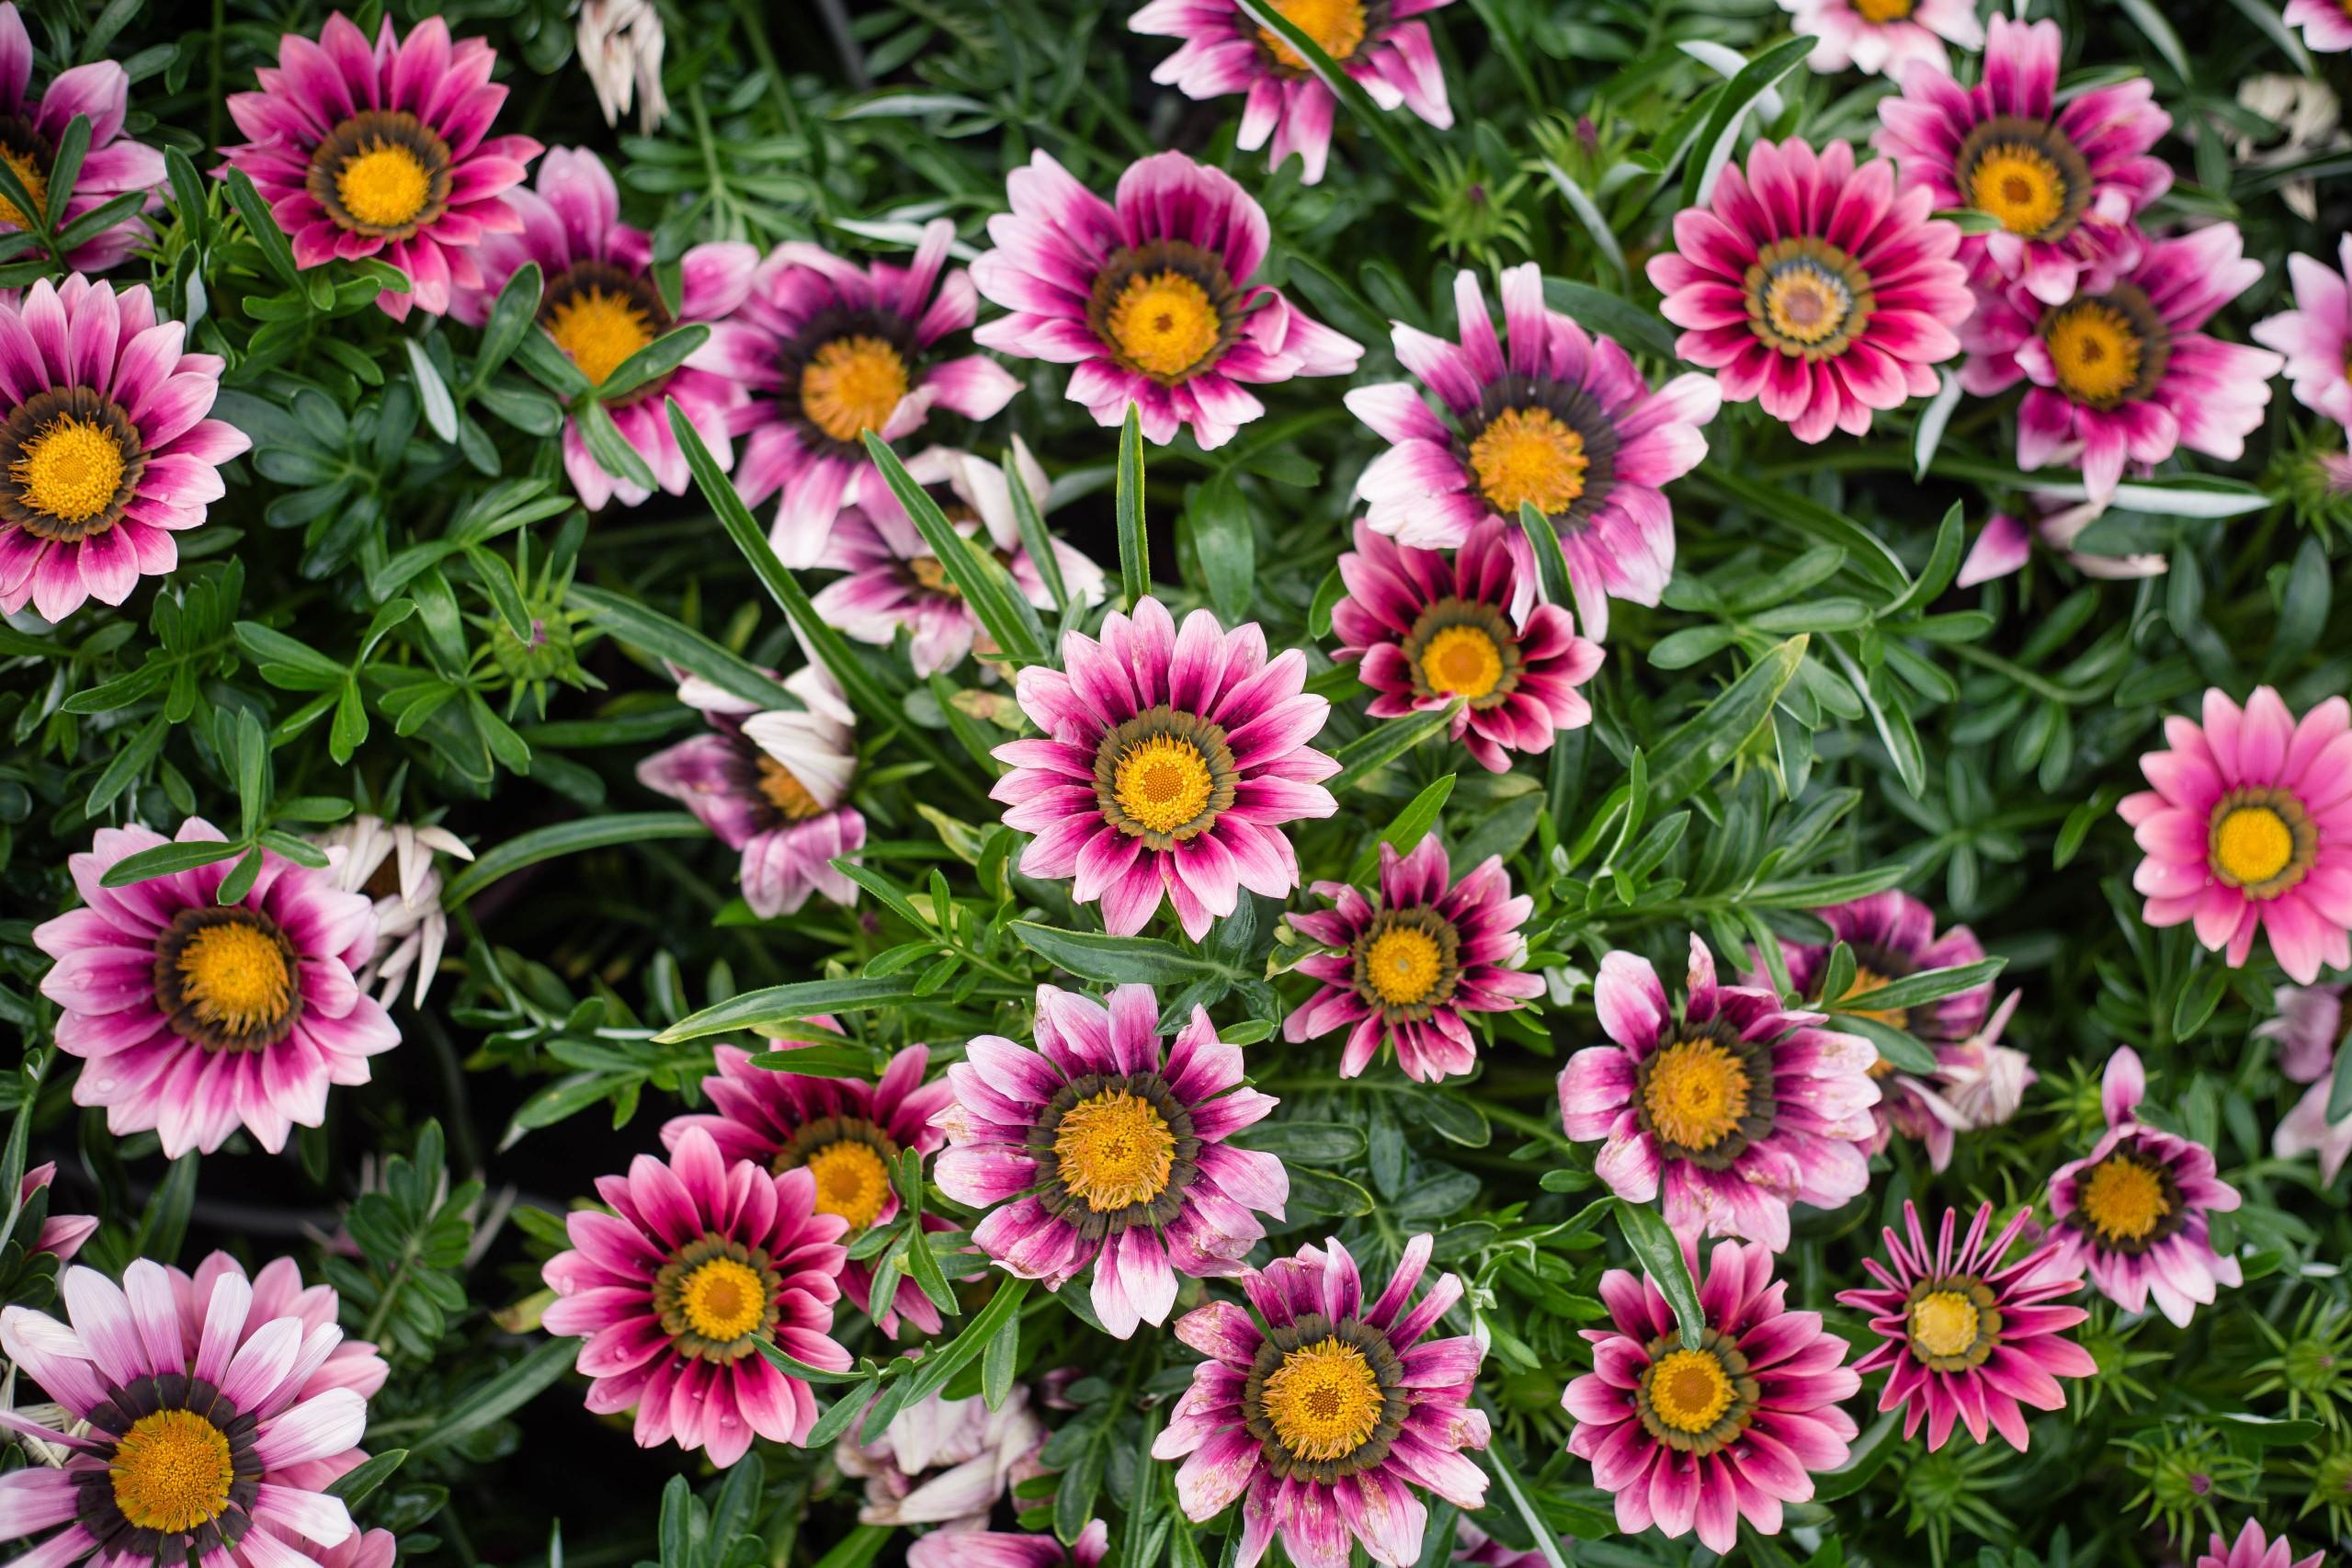 Gazania- New Day Pink Shades- 2 Pack - Burr Oak Gardens, LLC